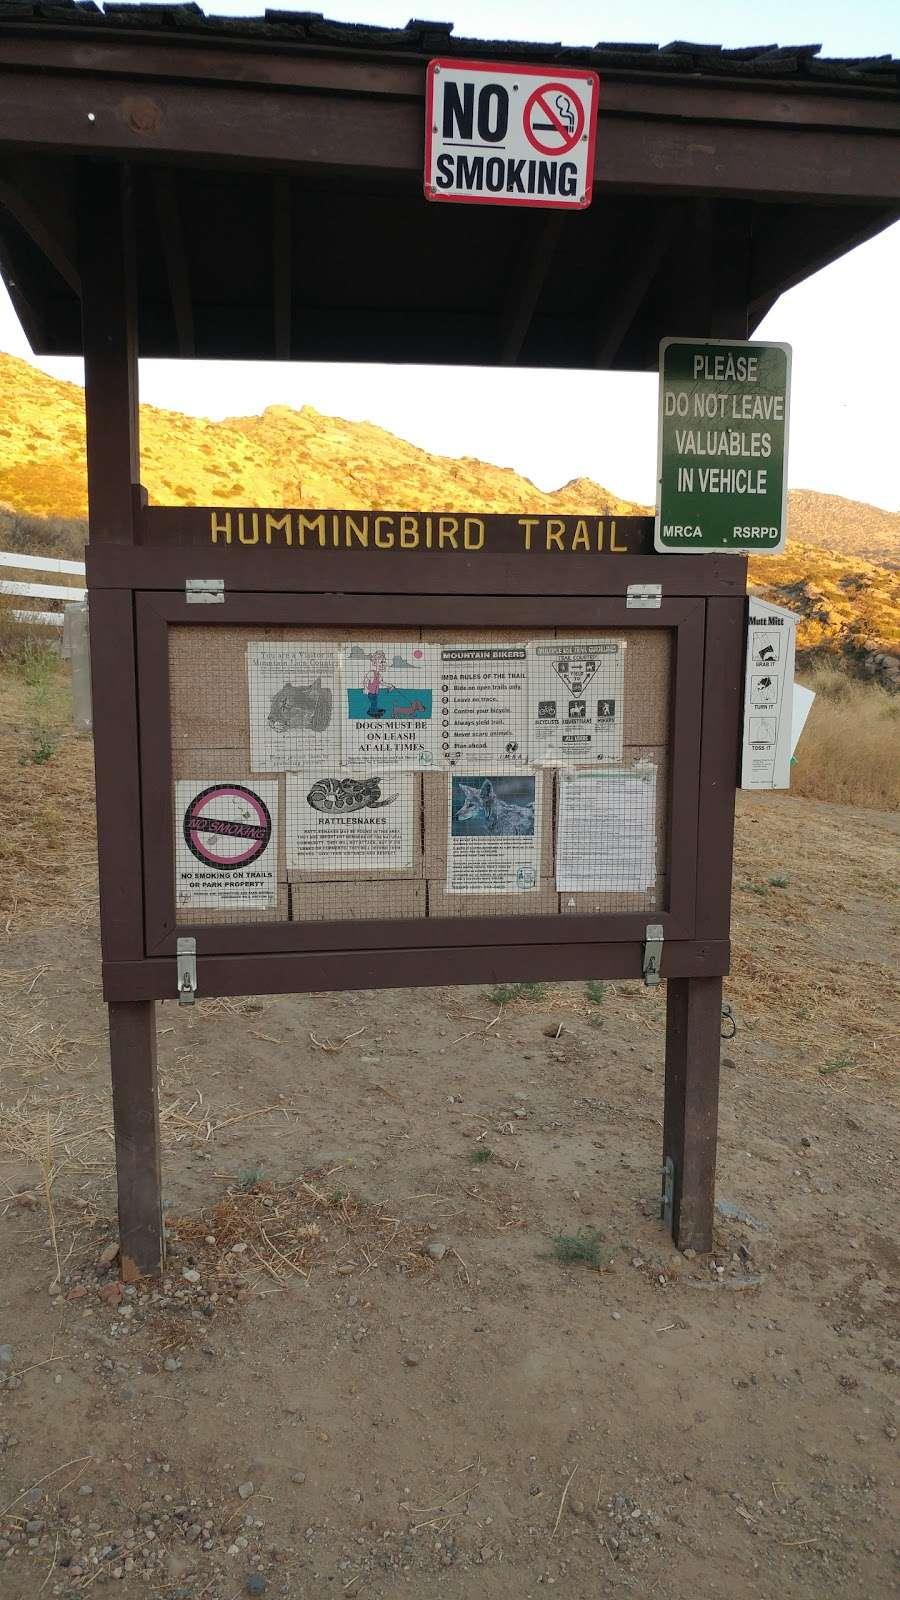 Hummingbird Trail - park  | Photo 7 of 10 | Address: 2954-2980 Kuehner Dr, Simi Valley, CA 93063, USA